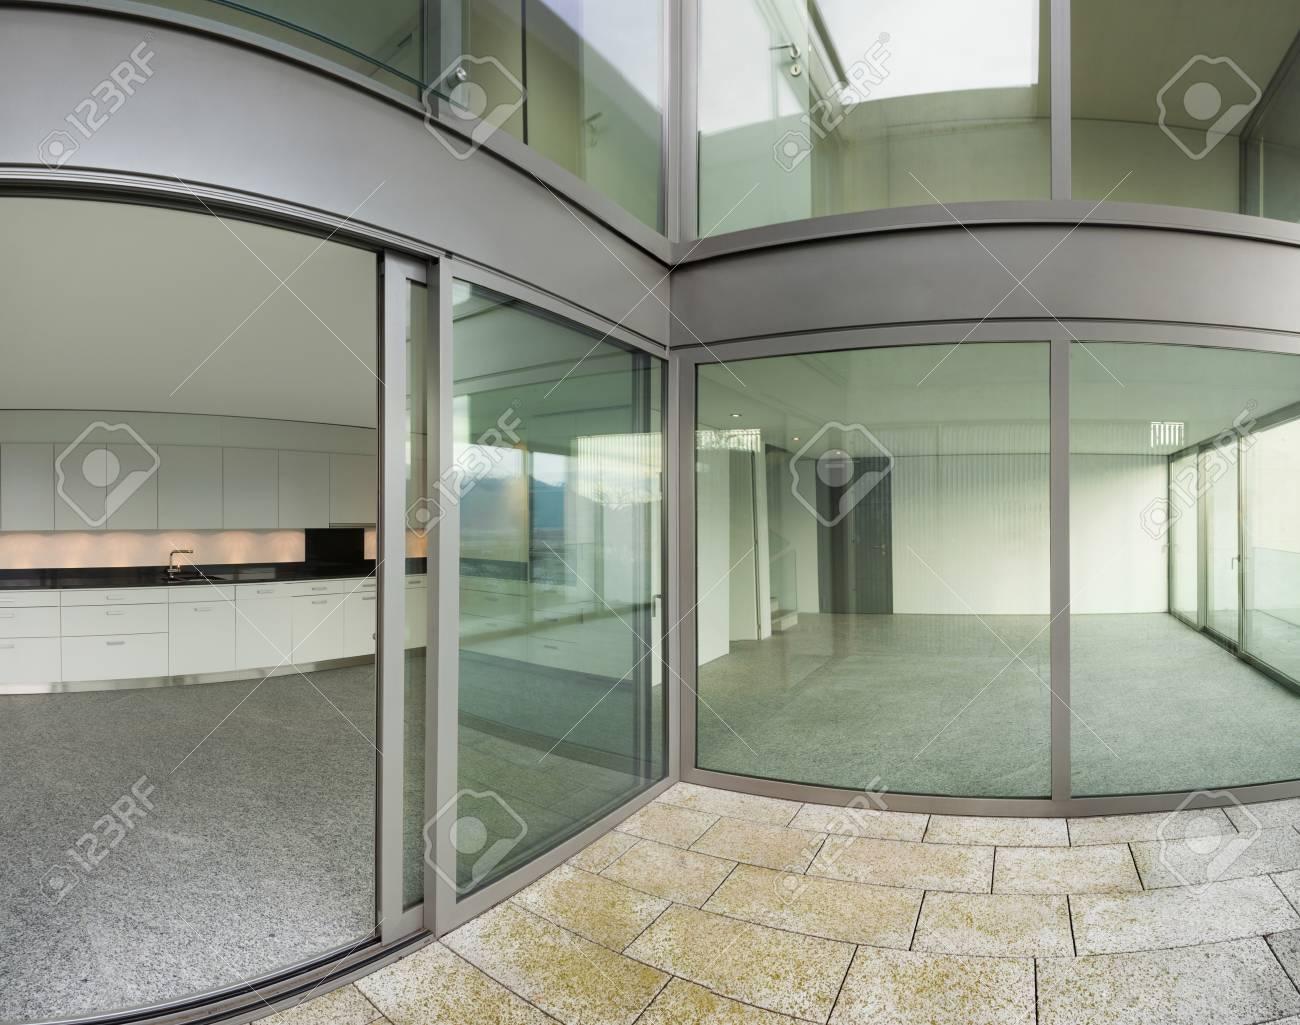 Arquitectura Edificio Moderno Vista Desde La Terraza